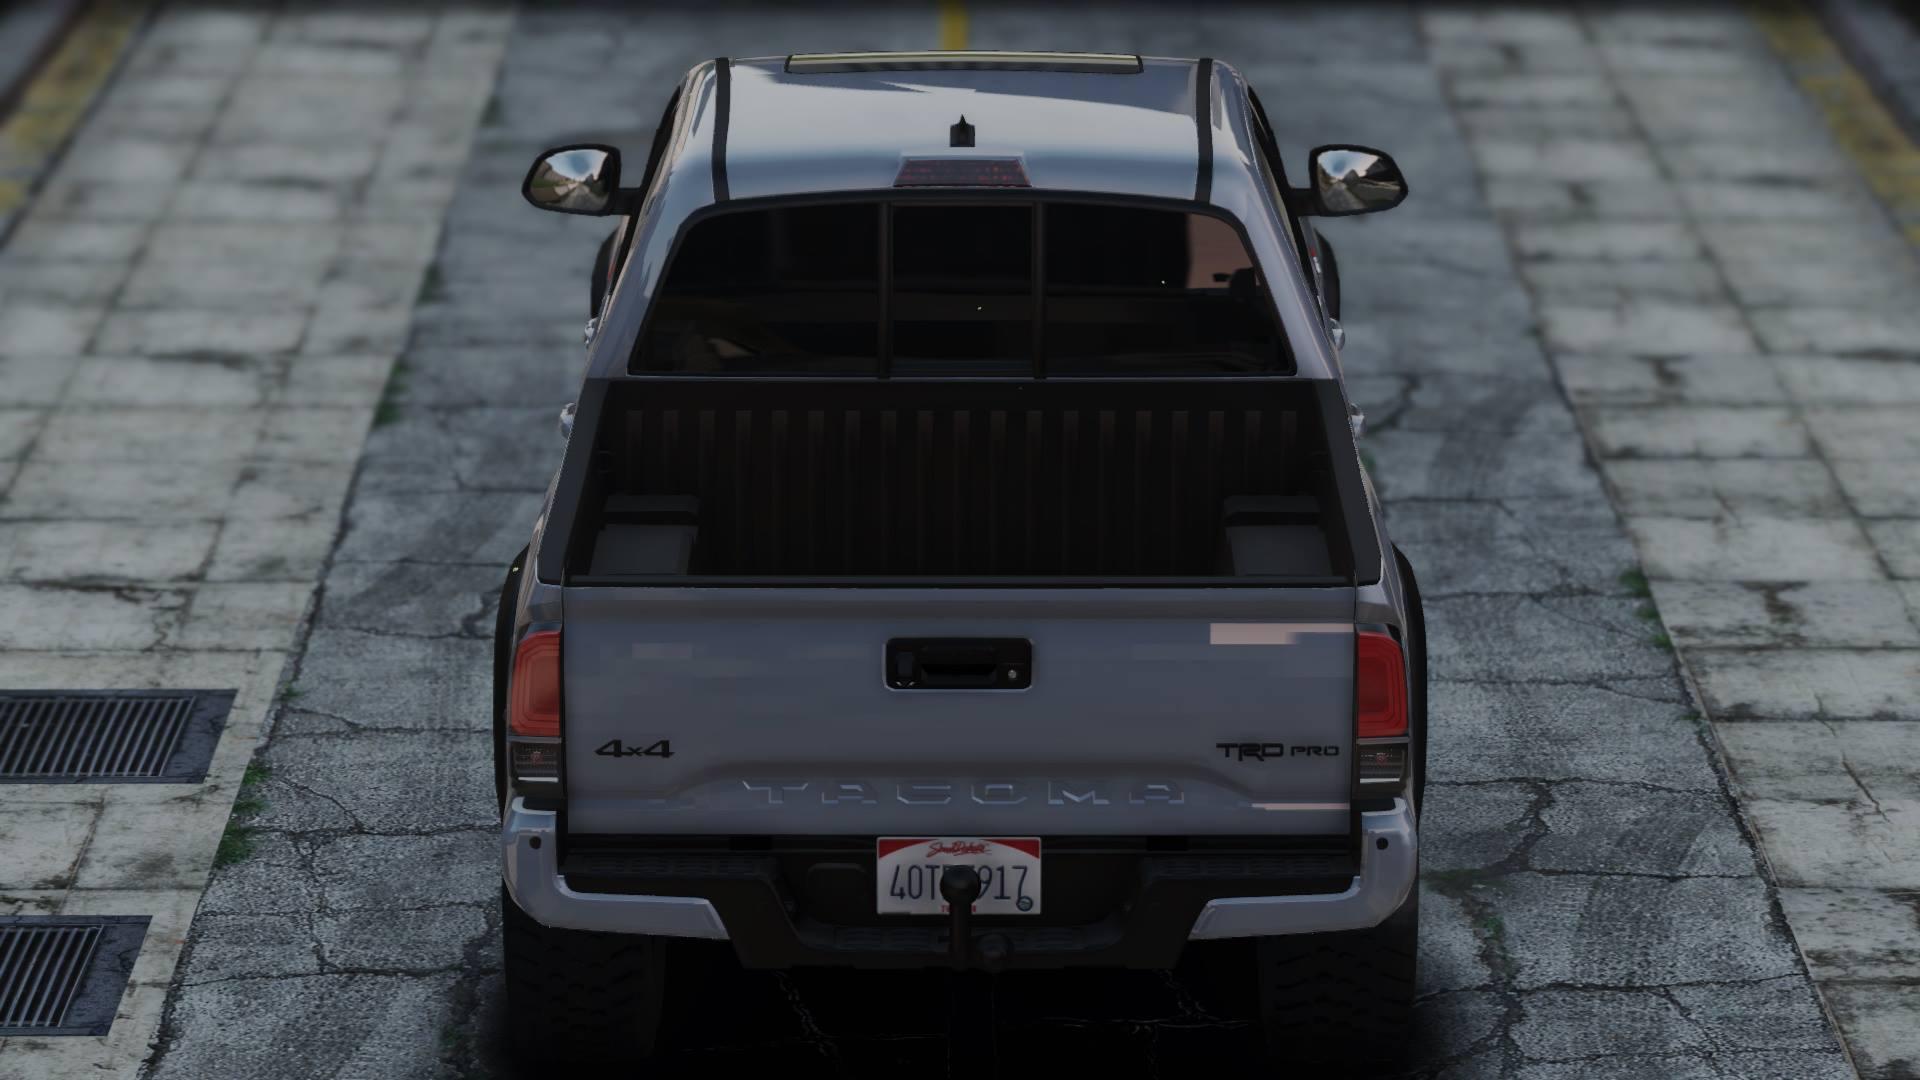 2017 Tacoma Trd Pro >> [VEHICLE] Toyota Tacoma TRD PRO 2016-2017 | GTA5-Mods.com Forums